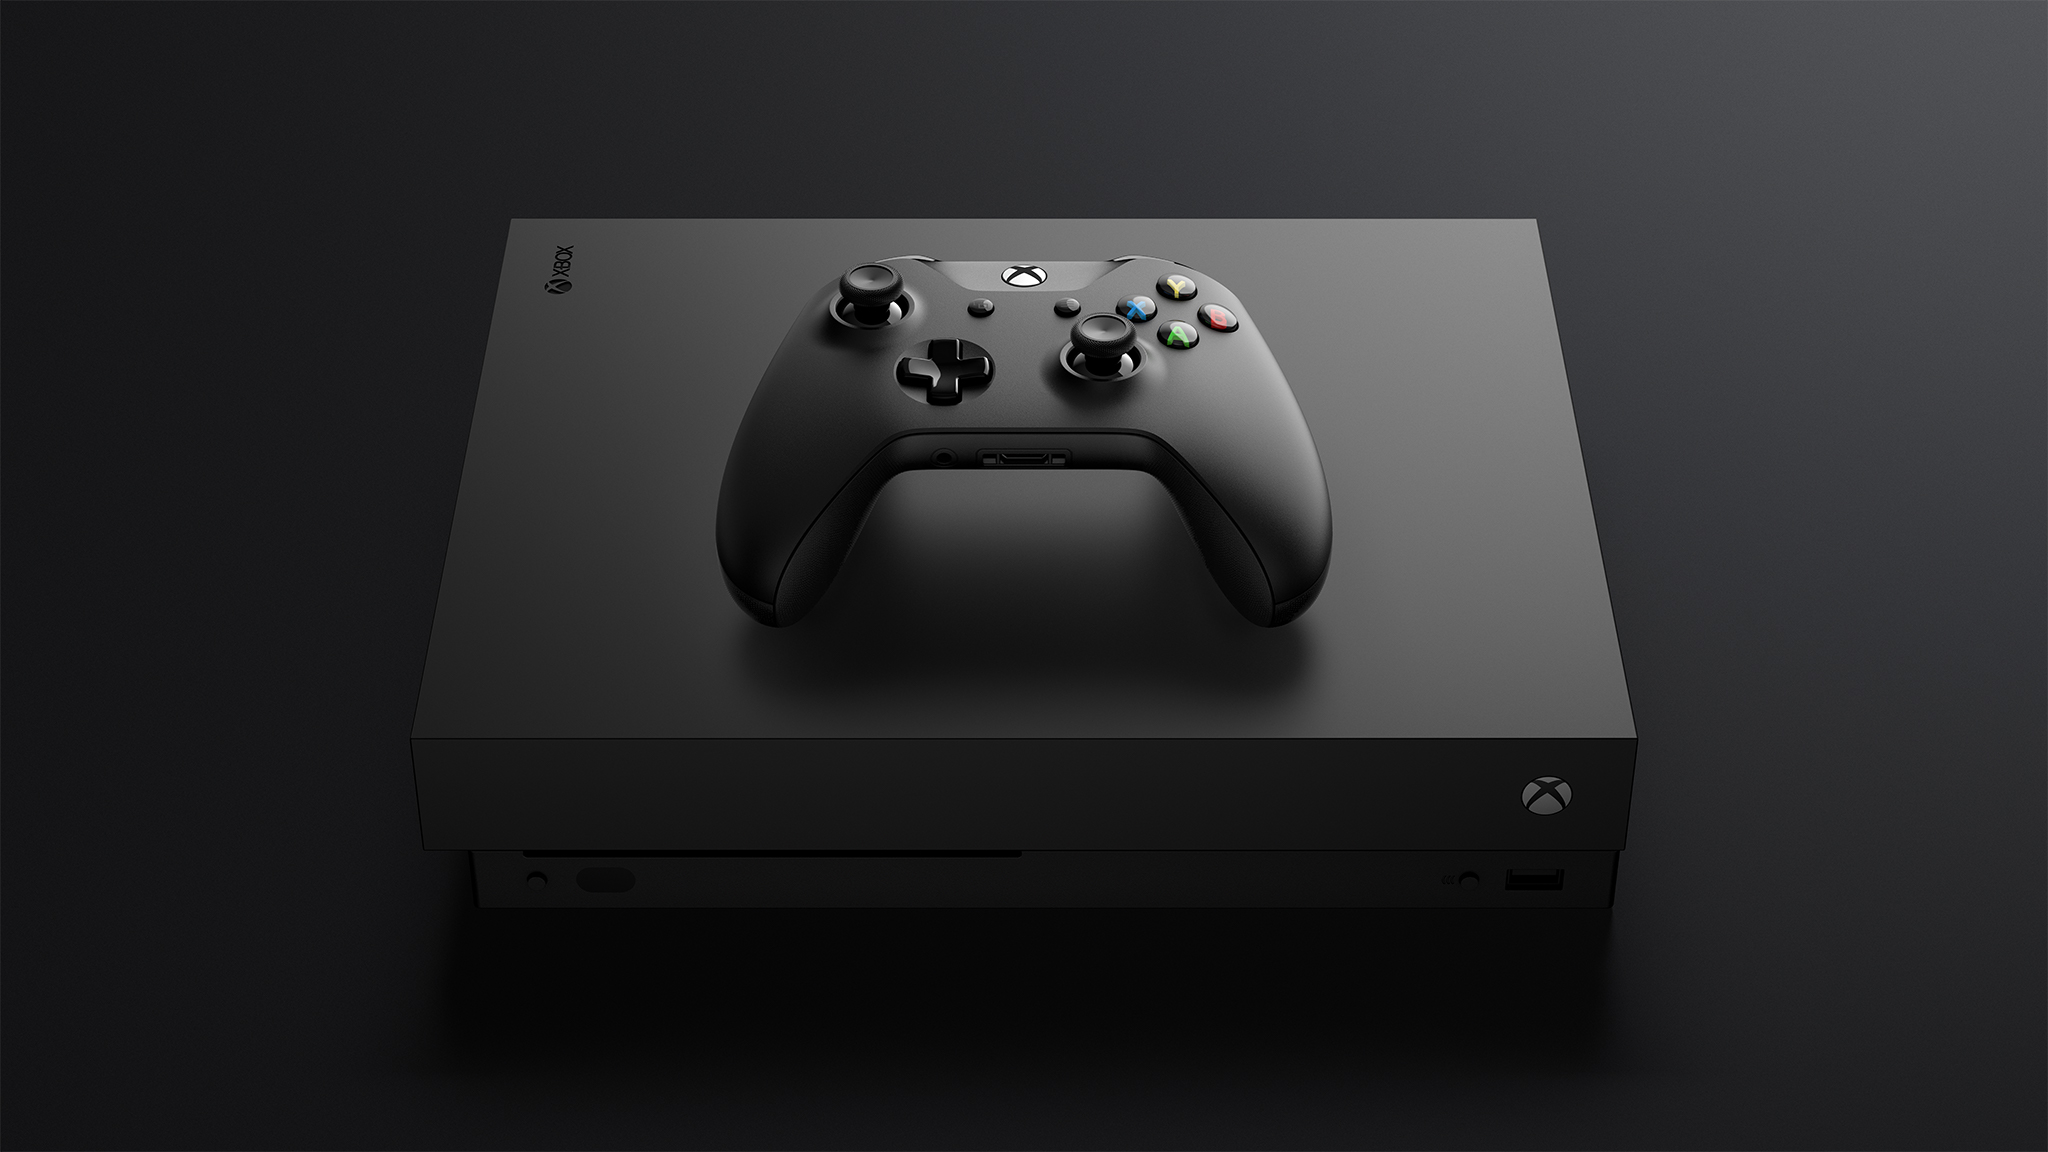 Cool Wallpaper Logo Xbox One - xbox-one-x-96  Pic_971099.jpg